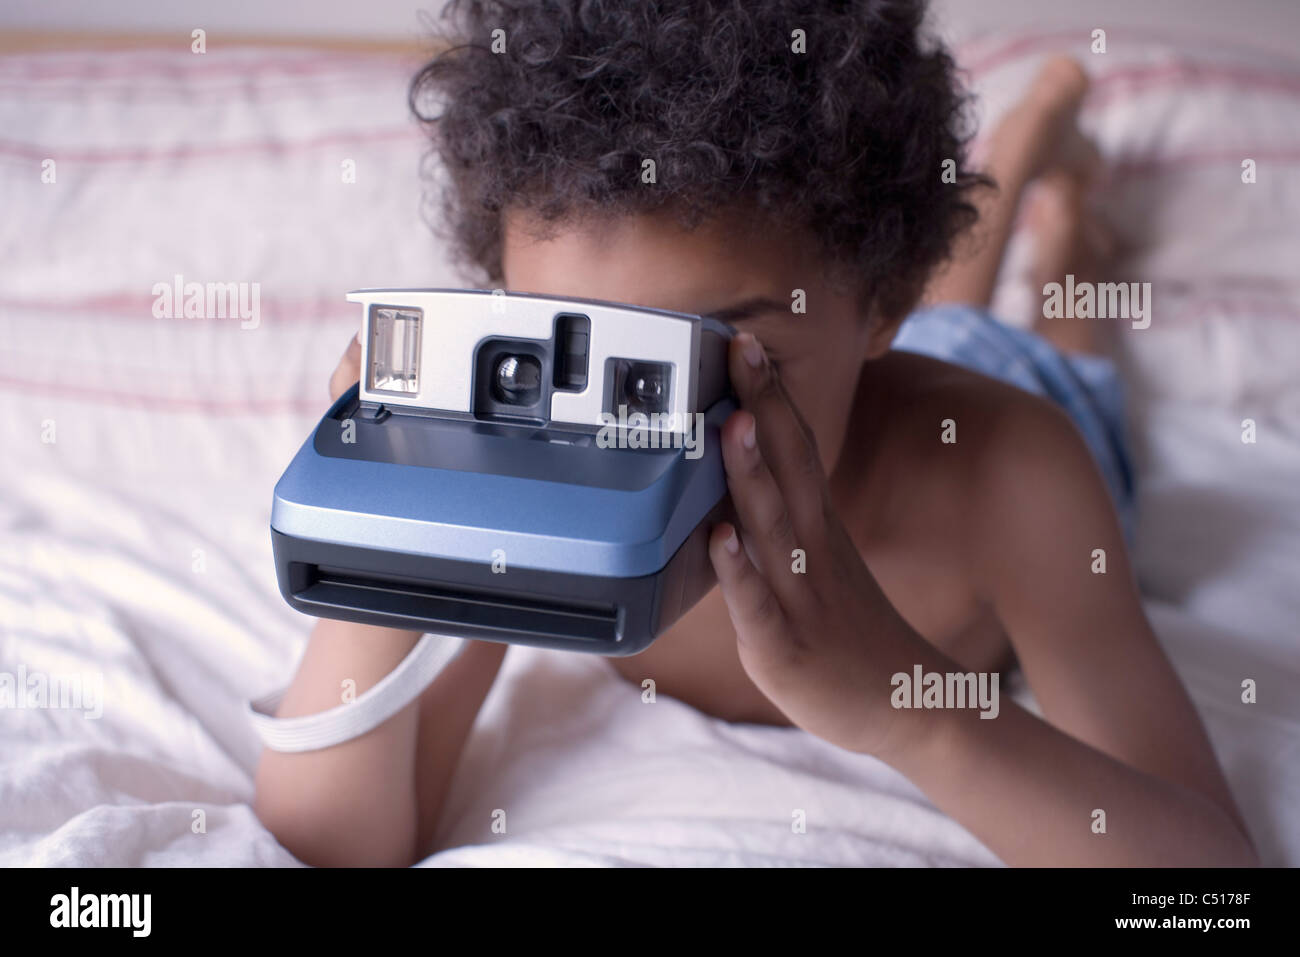 Liitle boy holding instant camera - Stock Image